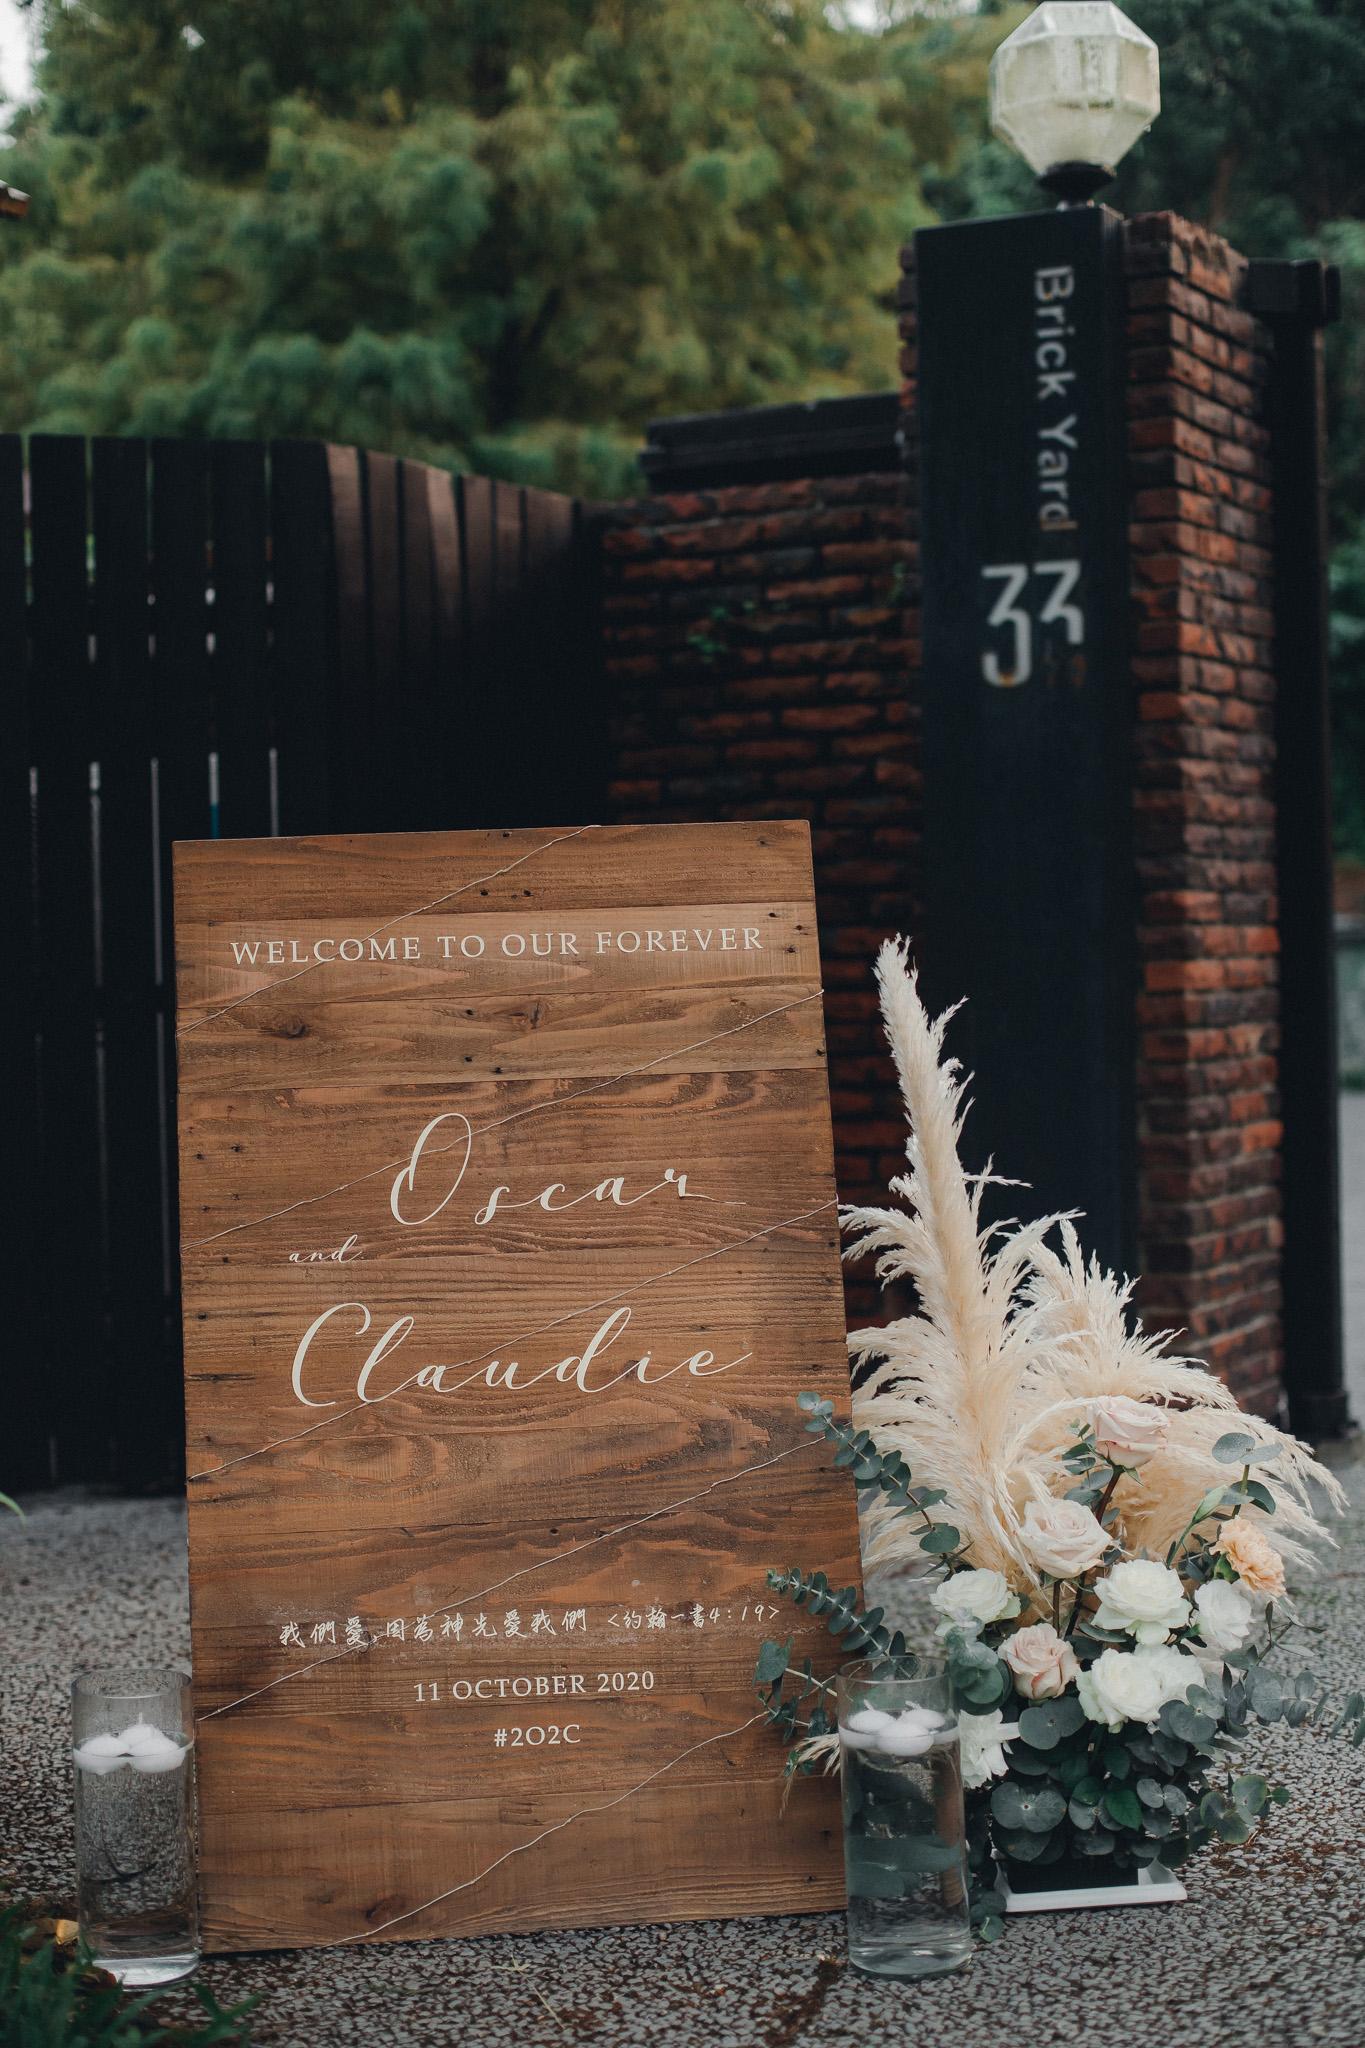 EW 台北婚攝 居米 濟南教會 Brick Yard 33 美軍俱樂部 婚禮 婚宴-58